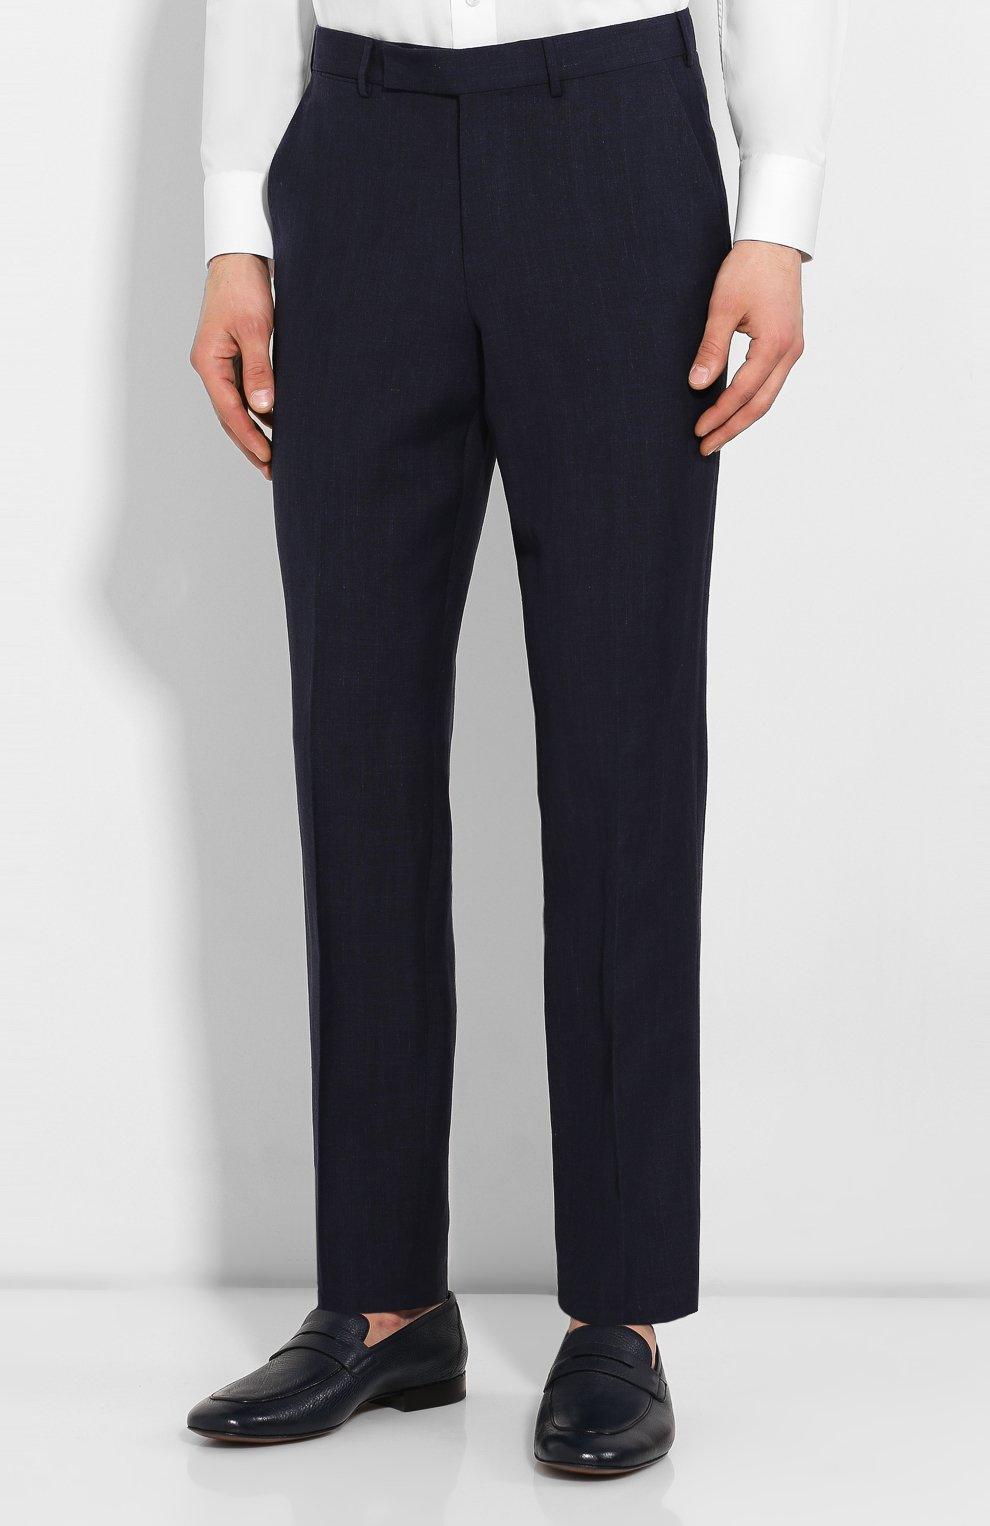 Мужские брюки из смеси льна и шерсти ERMENEGILDO ZEGNA темно-синего цвета, арт. 770F04/75TB12   Фото 3